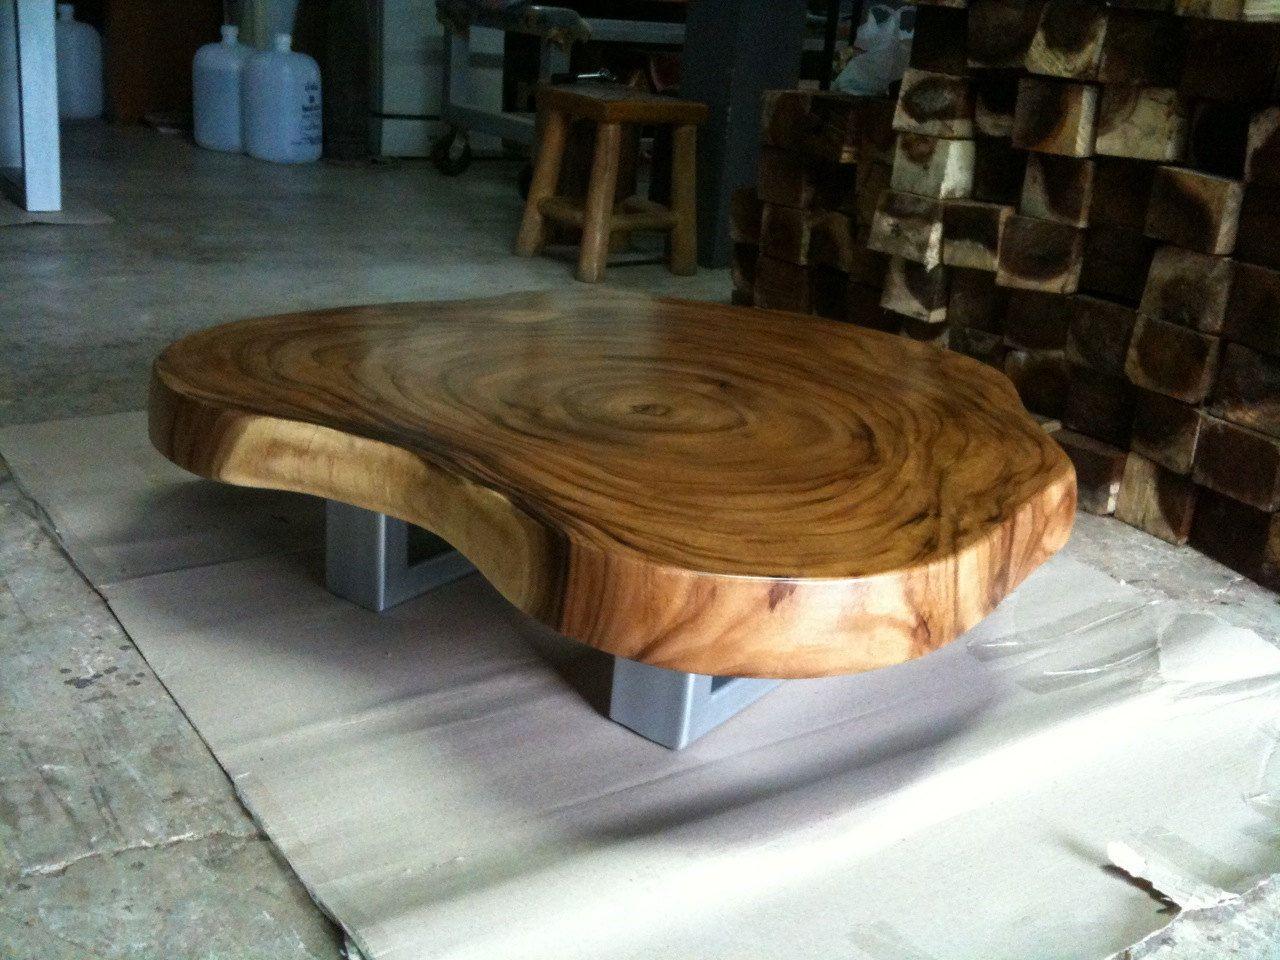 Coffee Table Reclaimed Acacia Wood Solid Slab Flowbkk On Etsy throughout sizing 1280 X 960